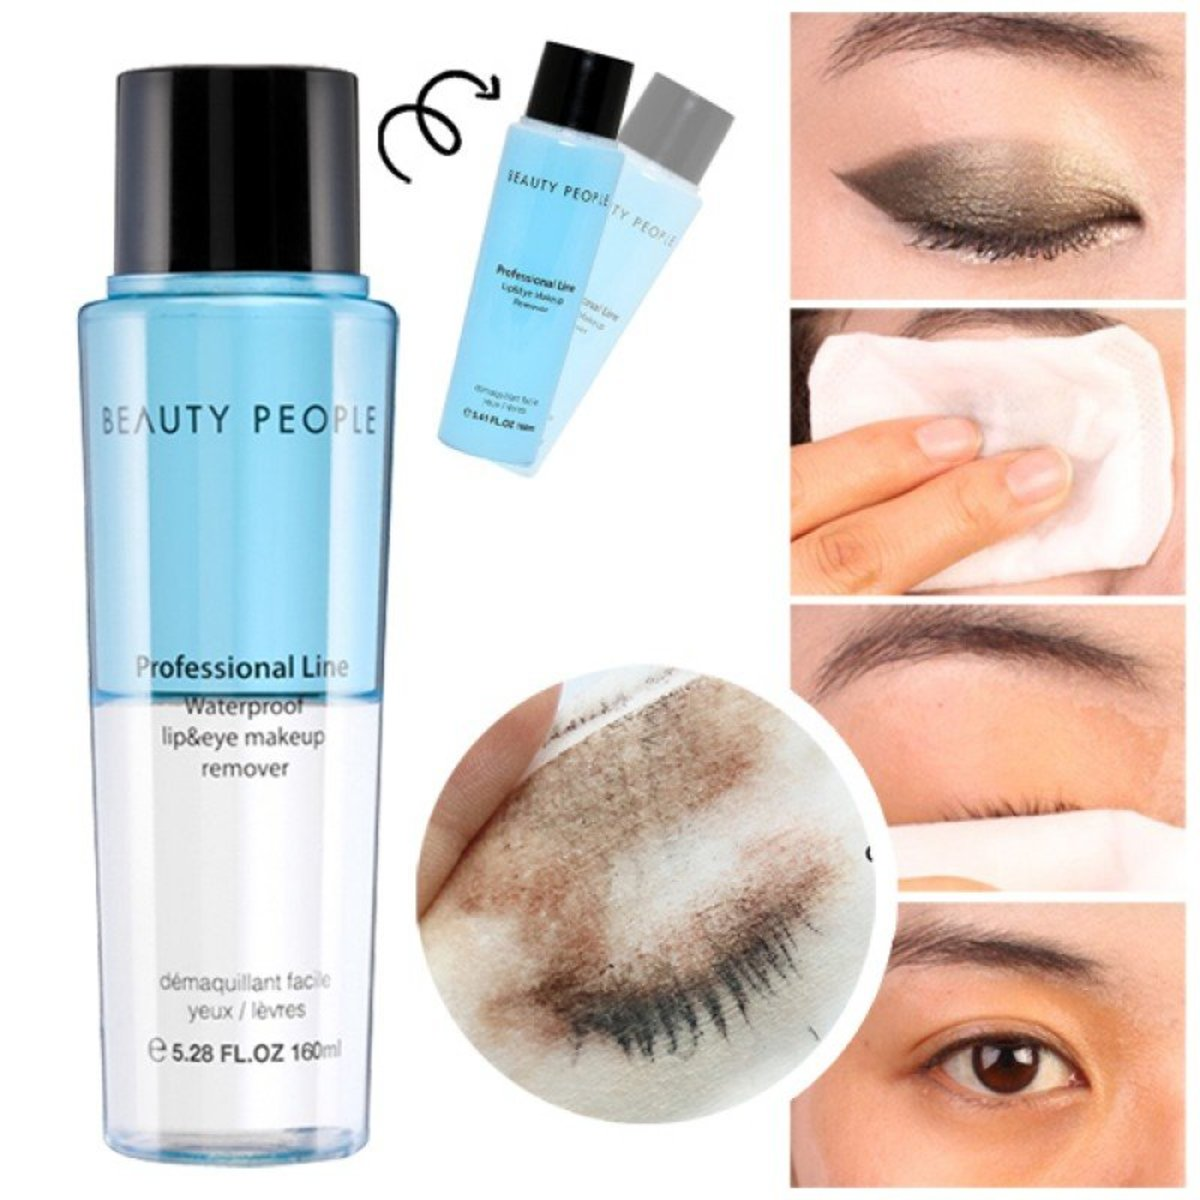 Waterproof Lip&Eye make up remover(professional line)